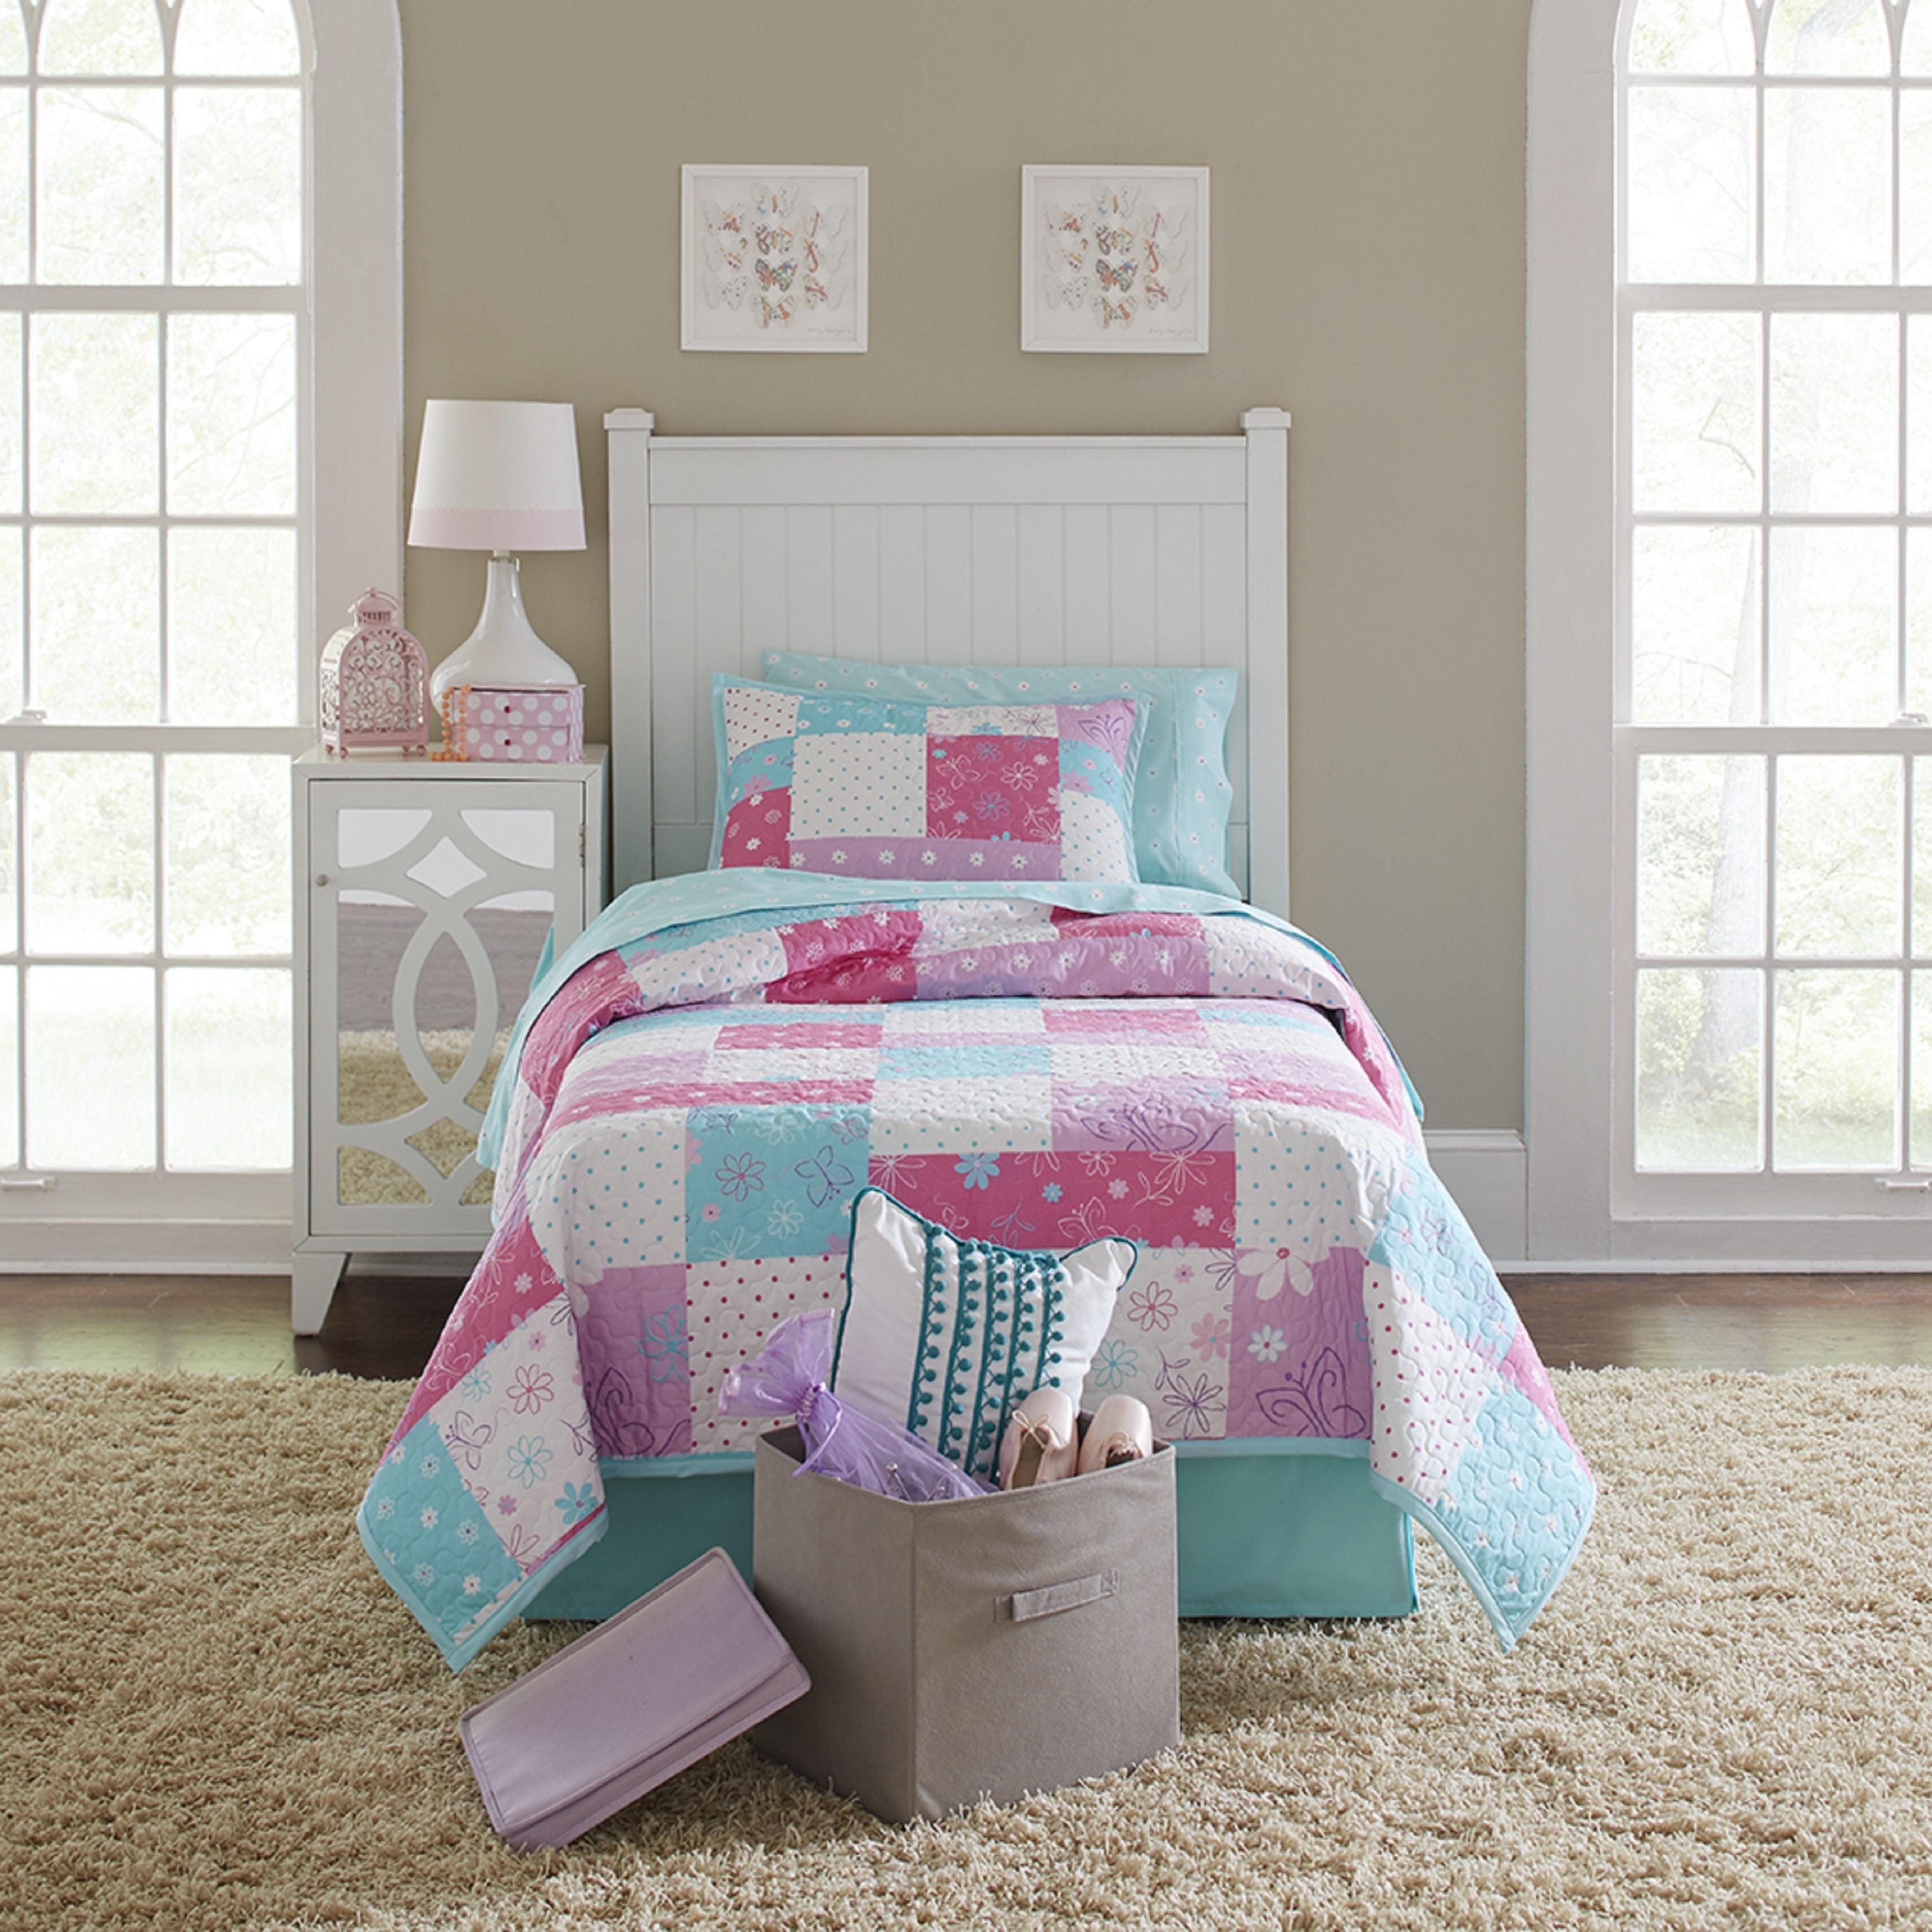 Floral Butterfly Blue Kids Girl Room Soft Bedspread Coverlet Quilt Shams 2//3PC